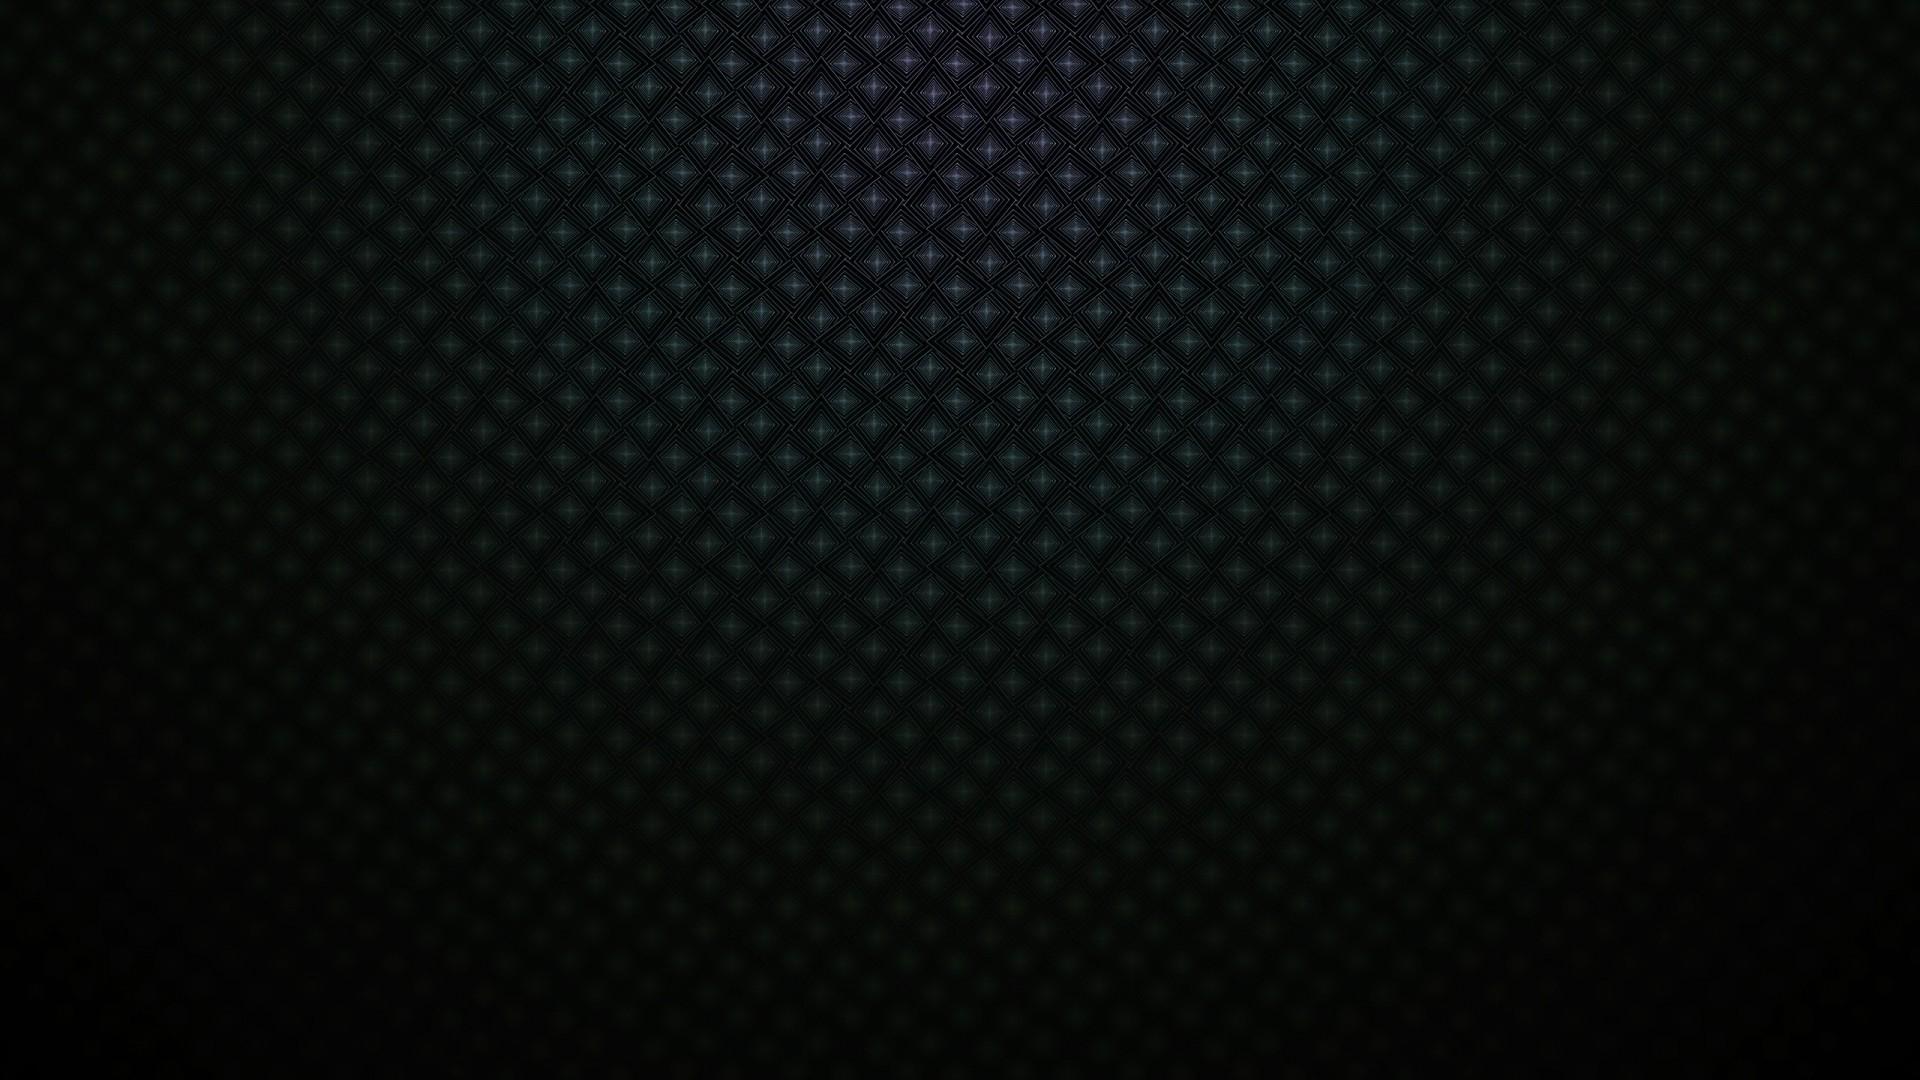 Wallpaper lines, shapes, dark, patterns, shadows, texture